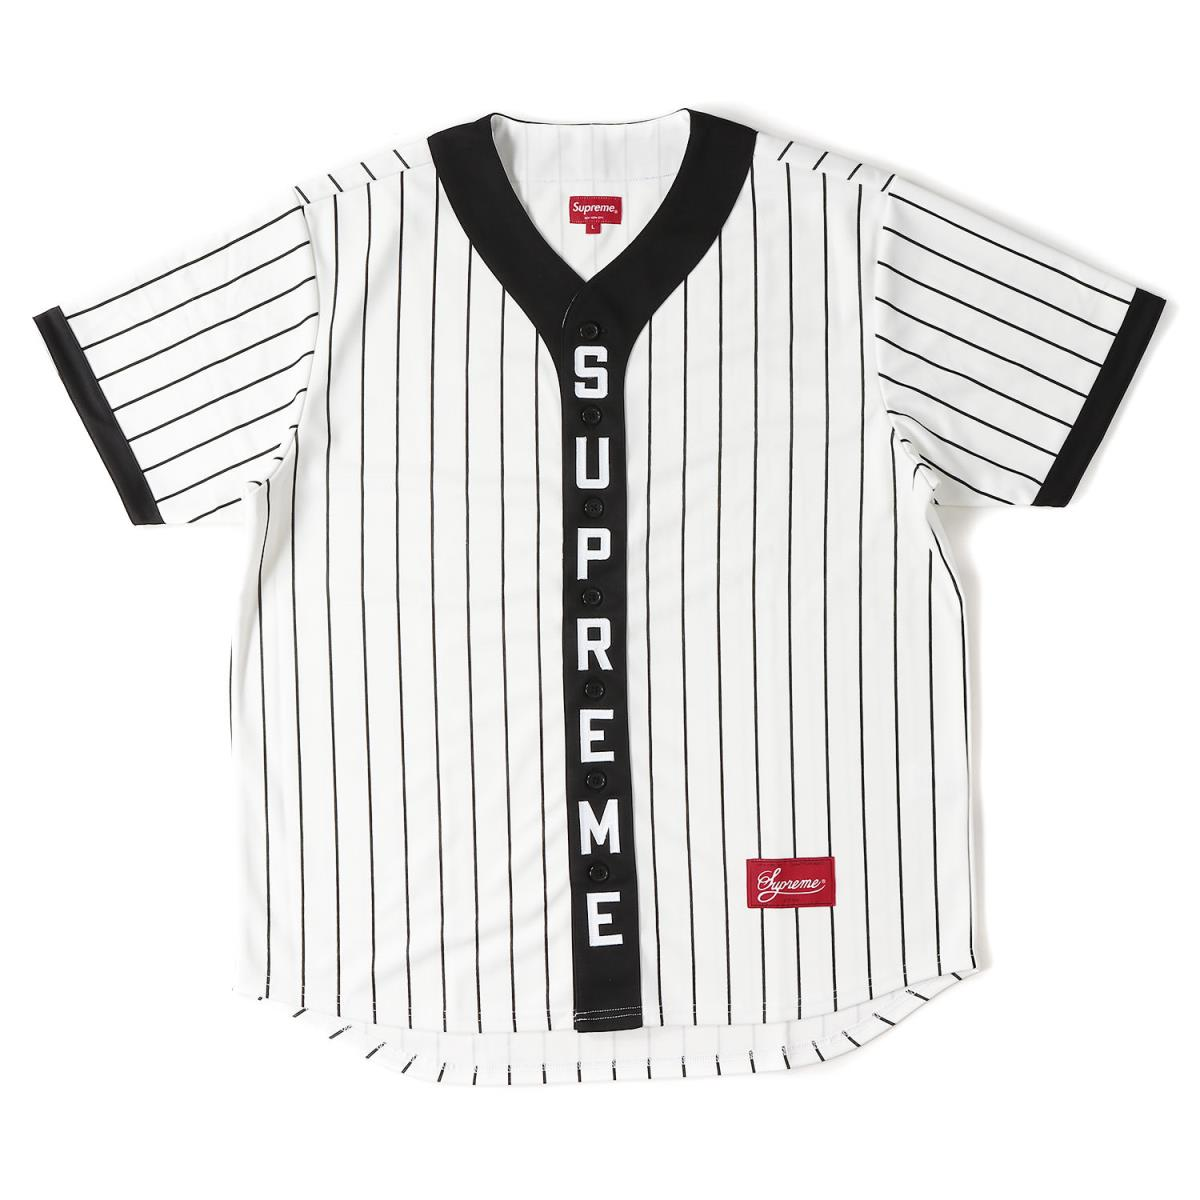 Supreme (シュプリーム) 18A/W バーチカルロゴベースボールシャツ(Vertical Logo Baseball Jersey) ホワイト L 【メンズ】【K2079】【あす楽☆対応可】